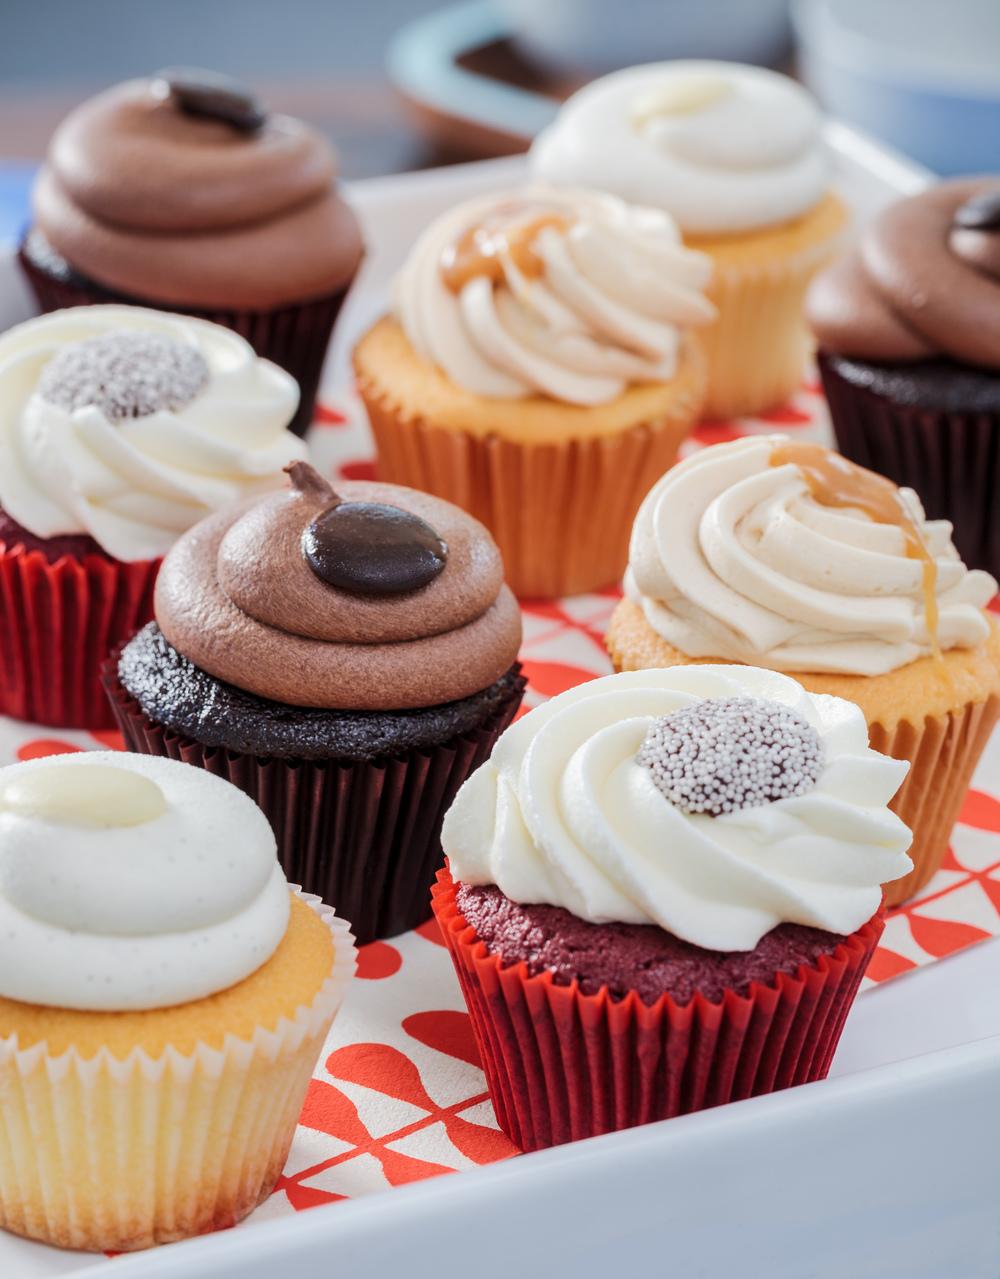 cupcakes_0001.jpg